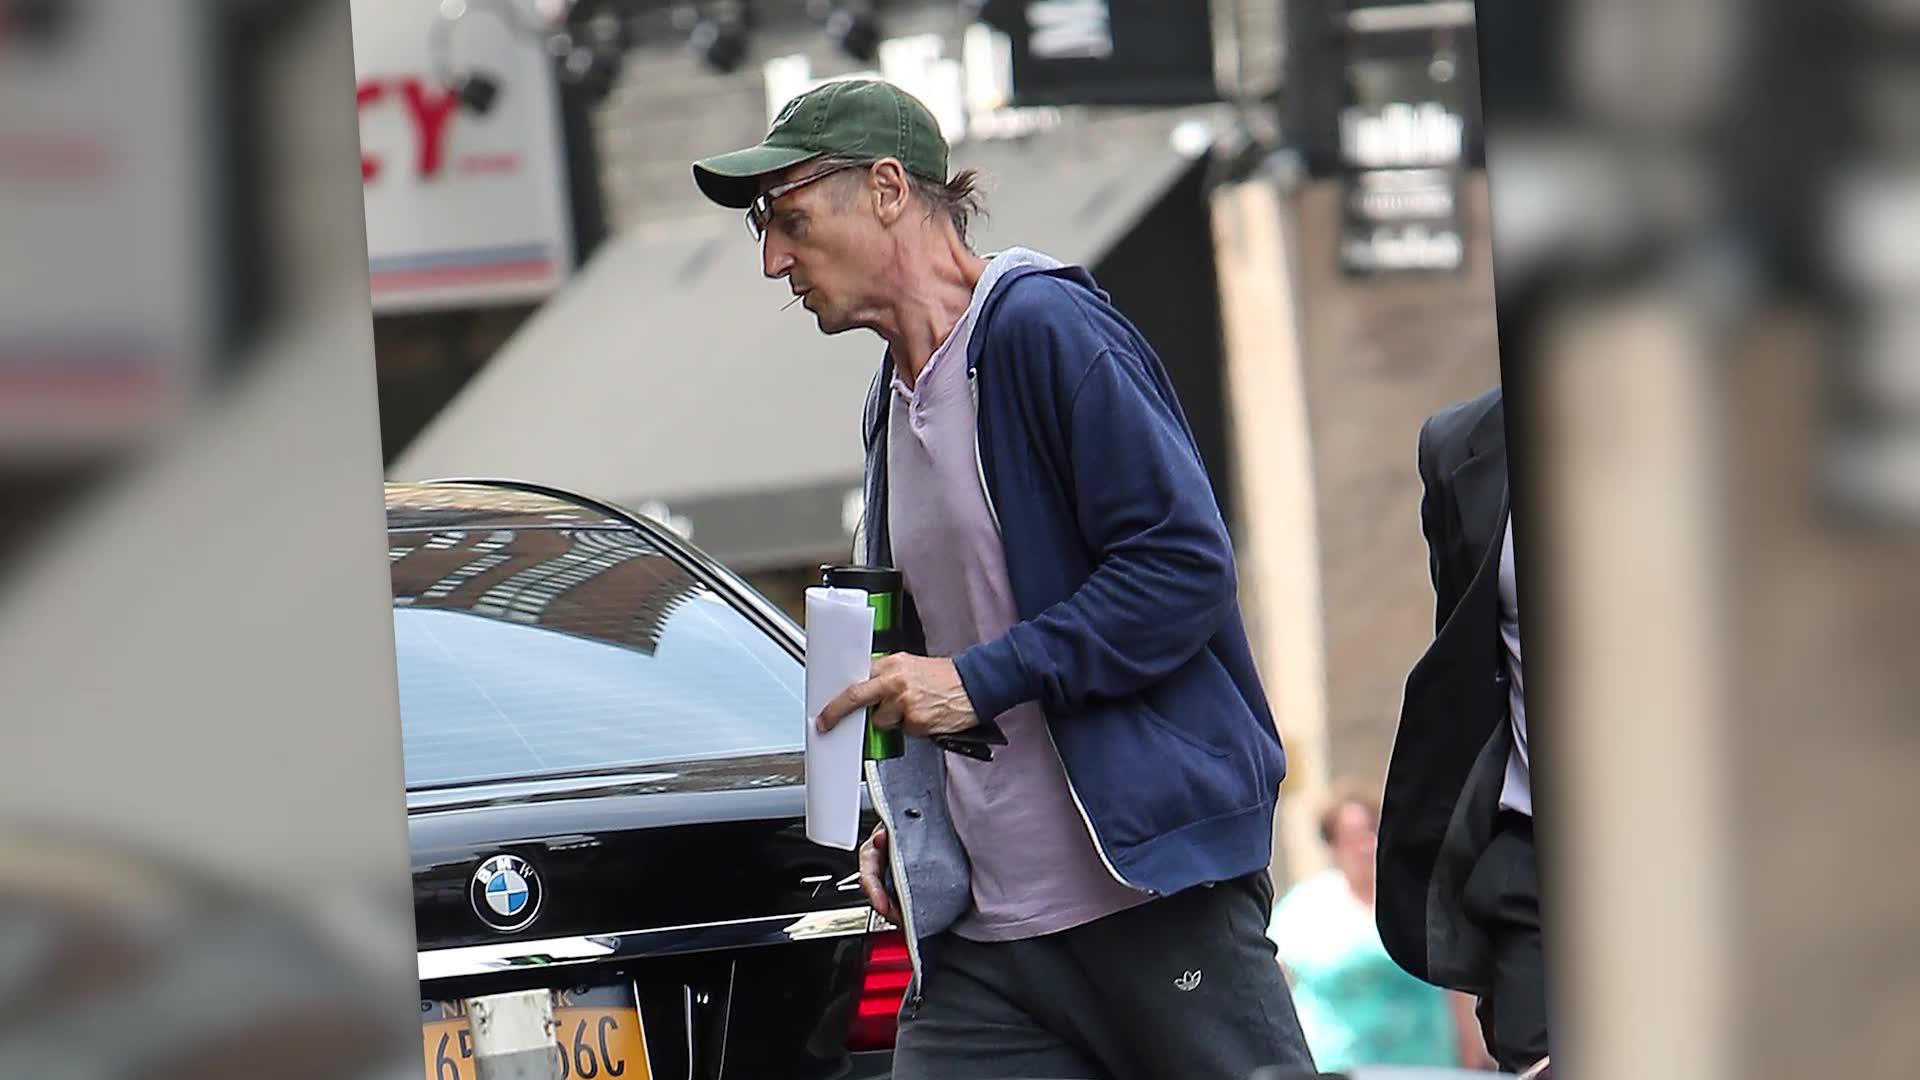 Liam Neeson Reveals Why He Got So Skinny